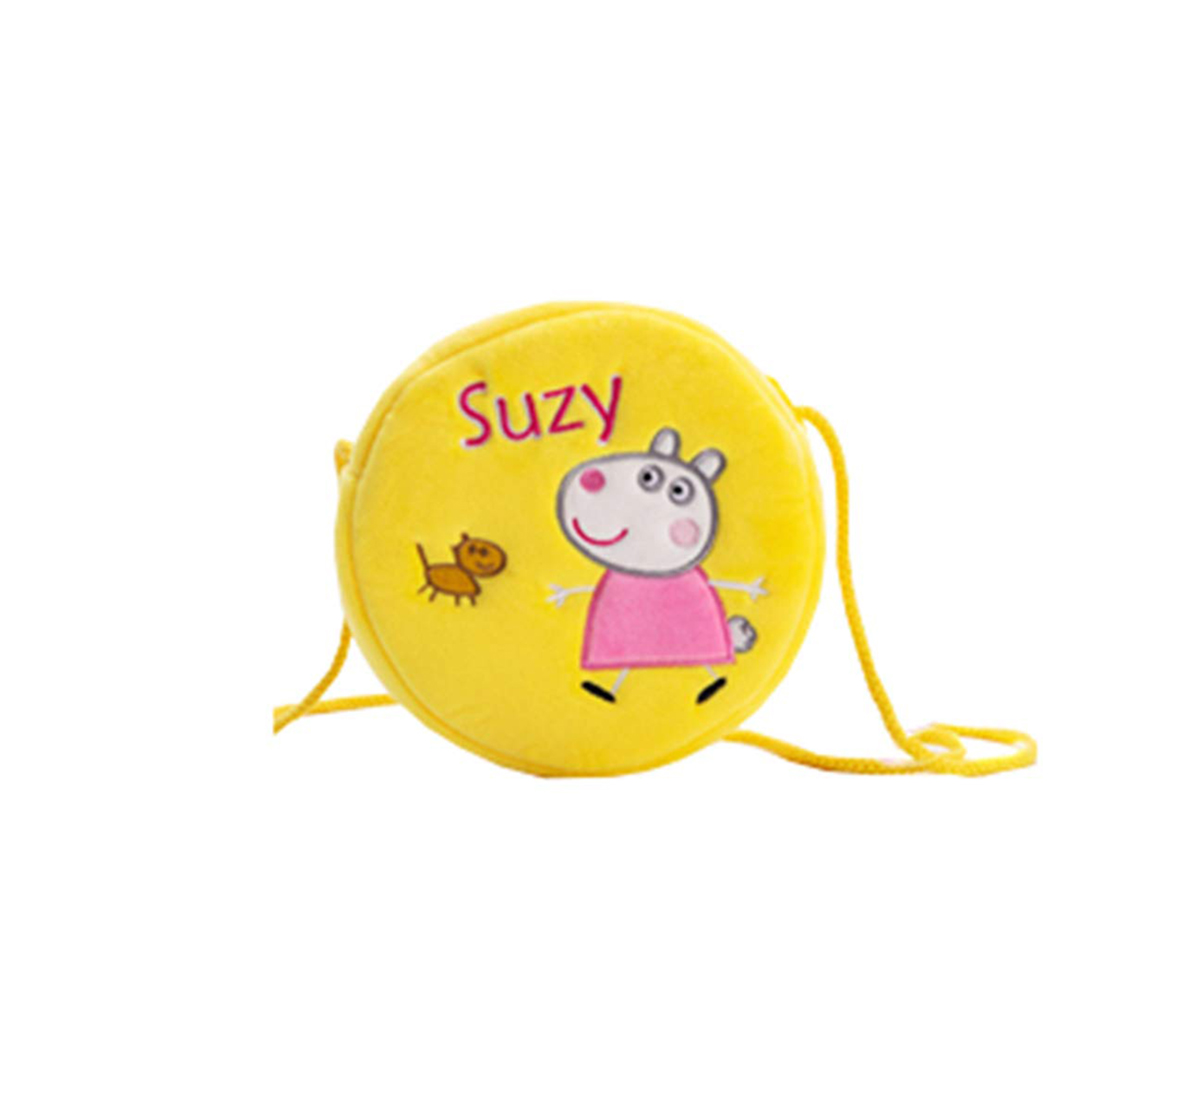 Peppa Pig | Peppa Pig Suzy Sheep Round Sling Bag Plush Accessory for Girls age 3Y+ - 16 Cm (Yellow)